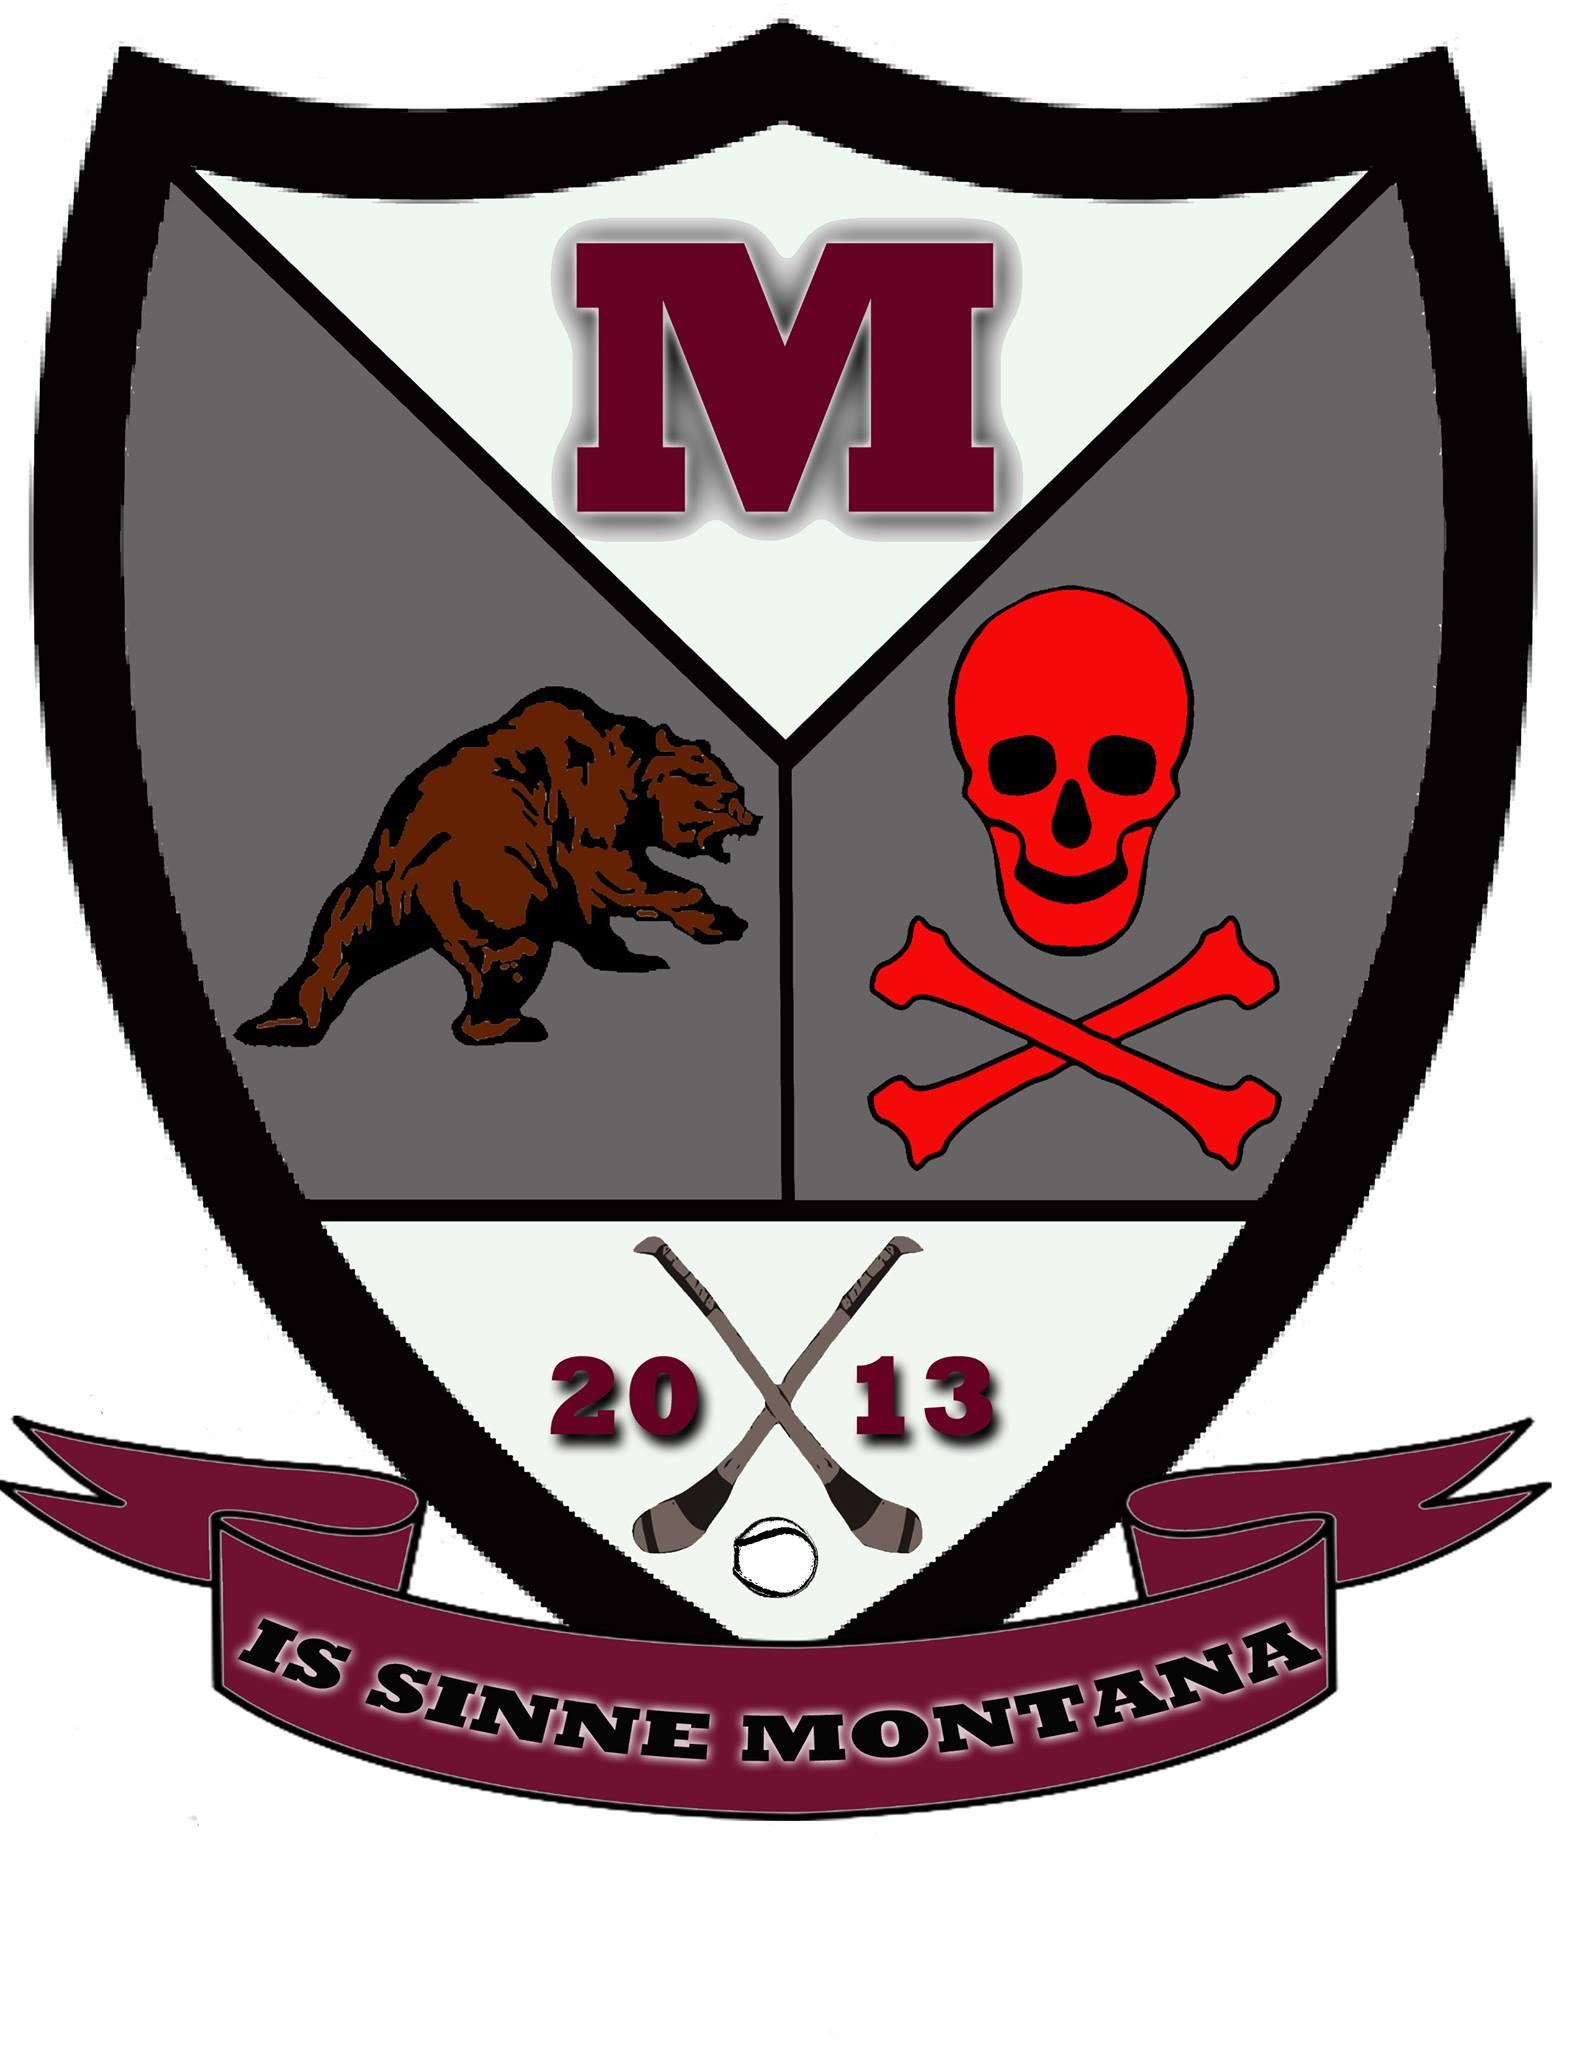 Montana Grizzlies Hurling - University of Montana